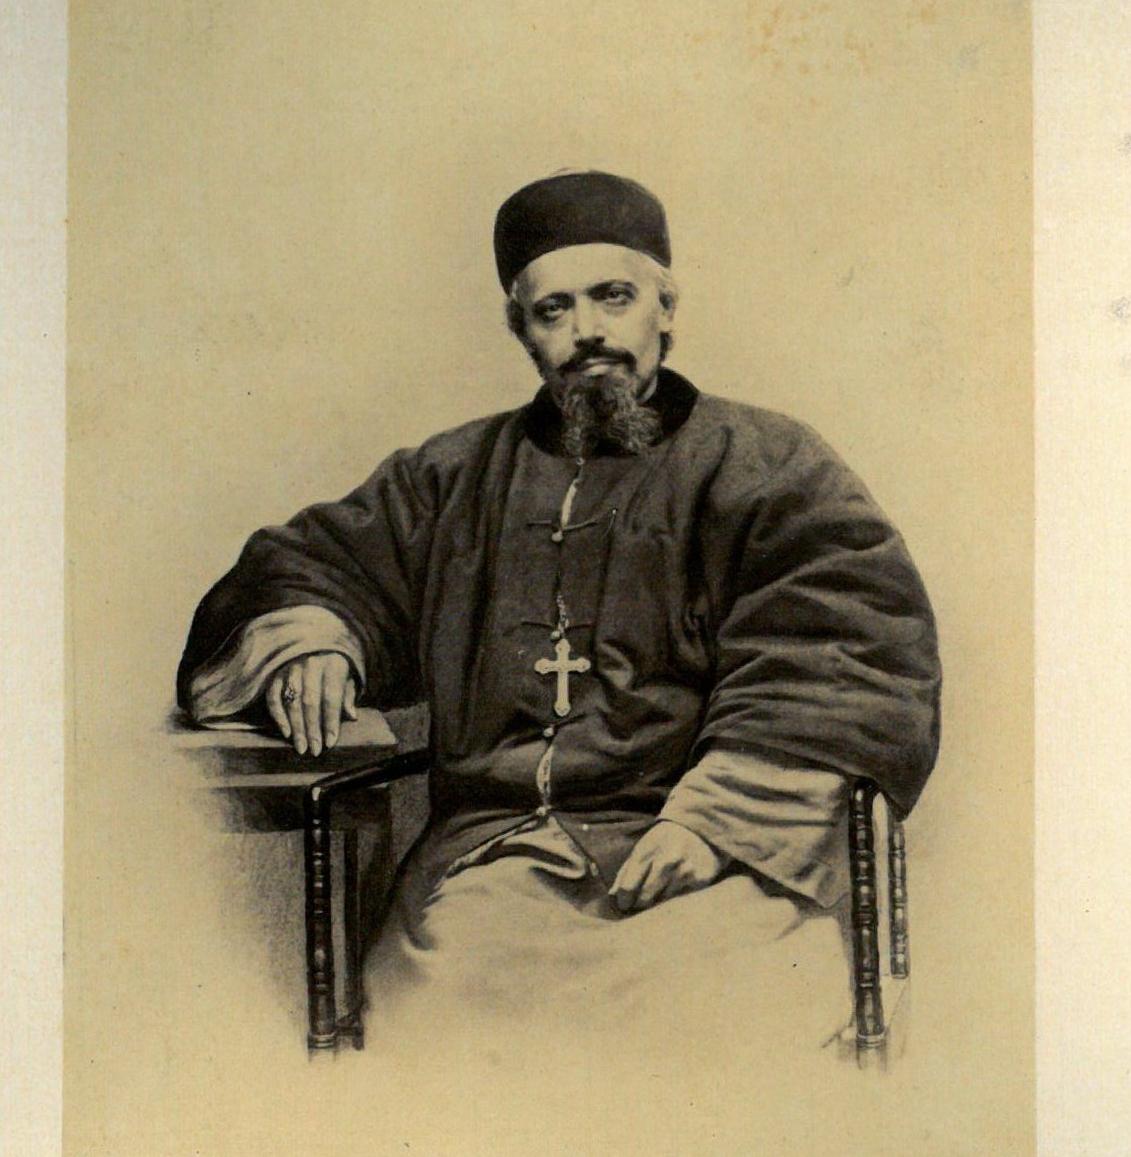 Album chinois (photograph album), before 1857